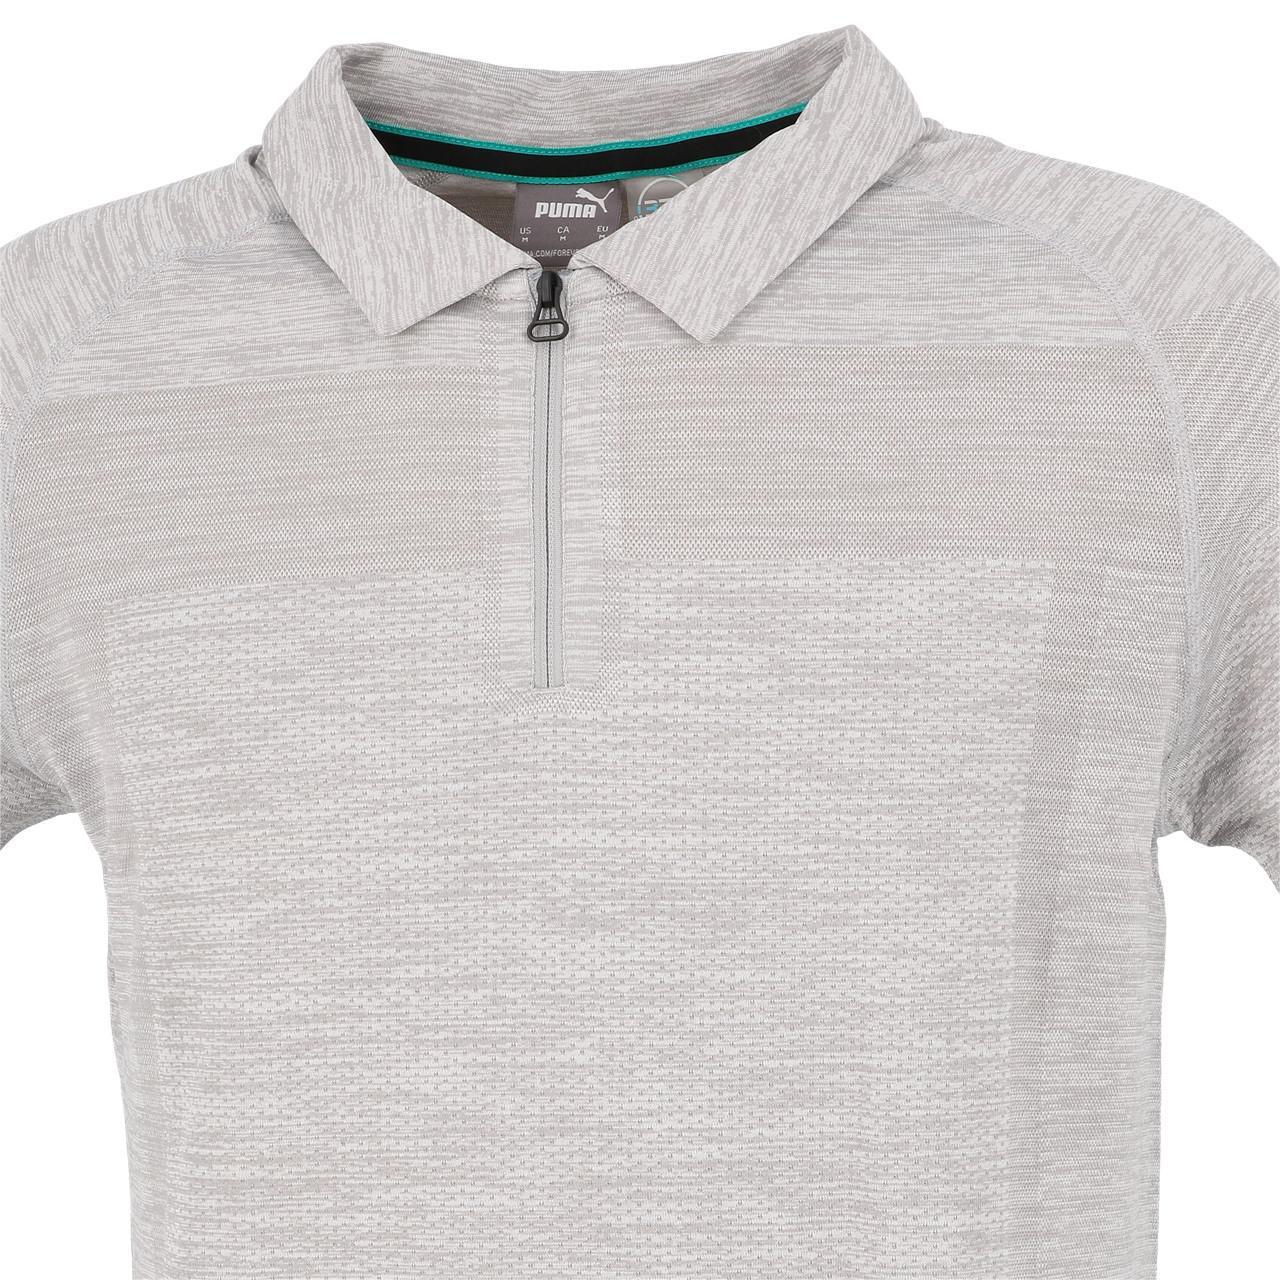 Short-Sleeve-Polo-Puma-Mapm-Rct-Evoknit-Groups-Polo-Grey-30141-New thumbnail 2